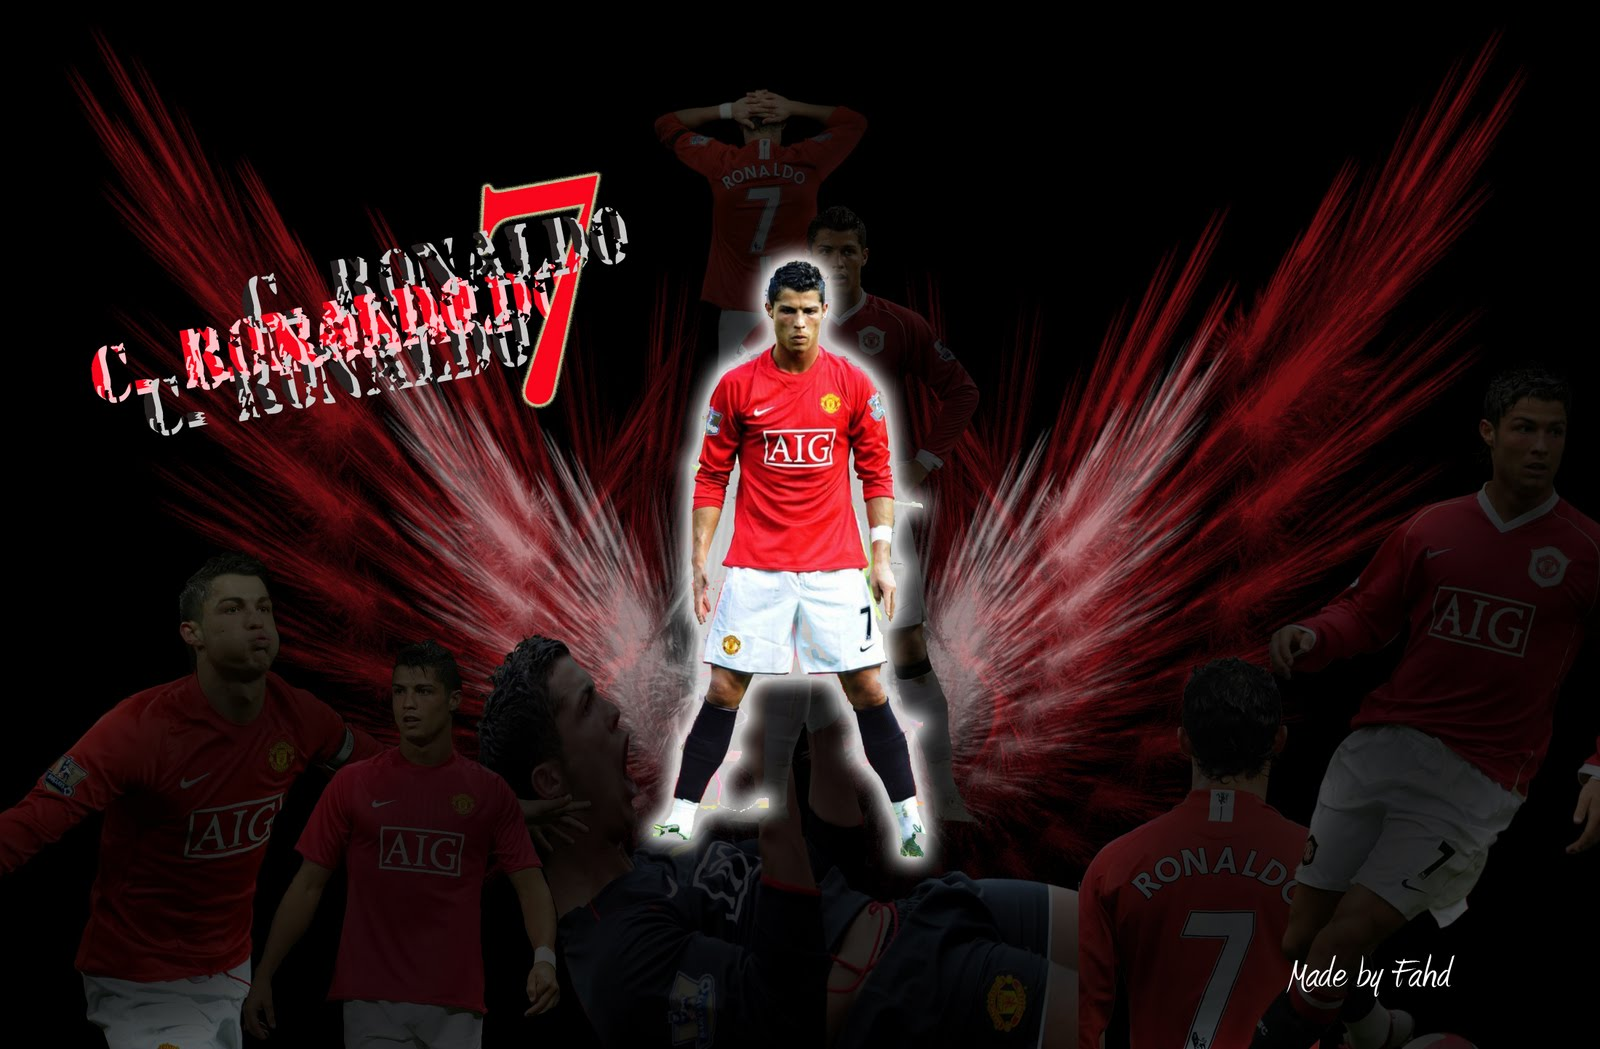 http://1.bp.blogspot.com/__c9qWlUD8Qs/S9KfuRL_vgI/AAAAAAAAIks/XVI038S97x0/s1600/1024x768_Cristiano_Ronaldo129.jpg